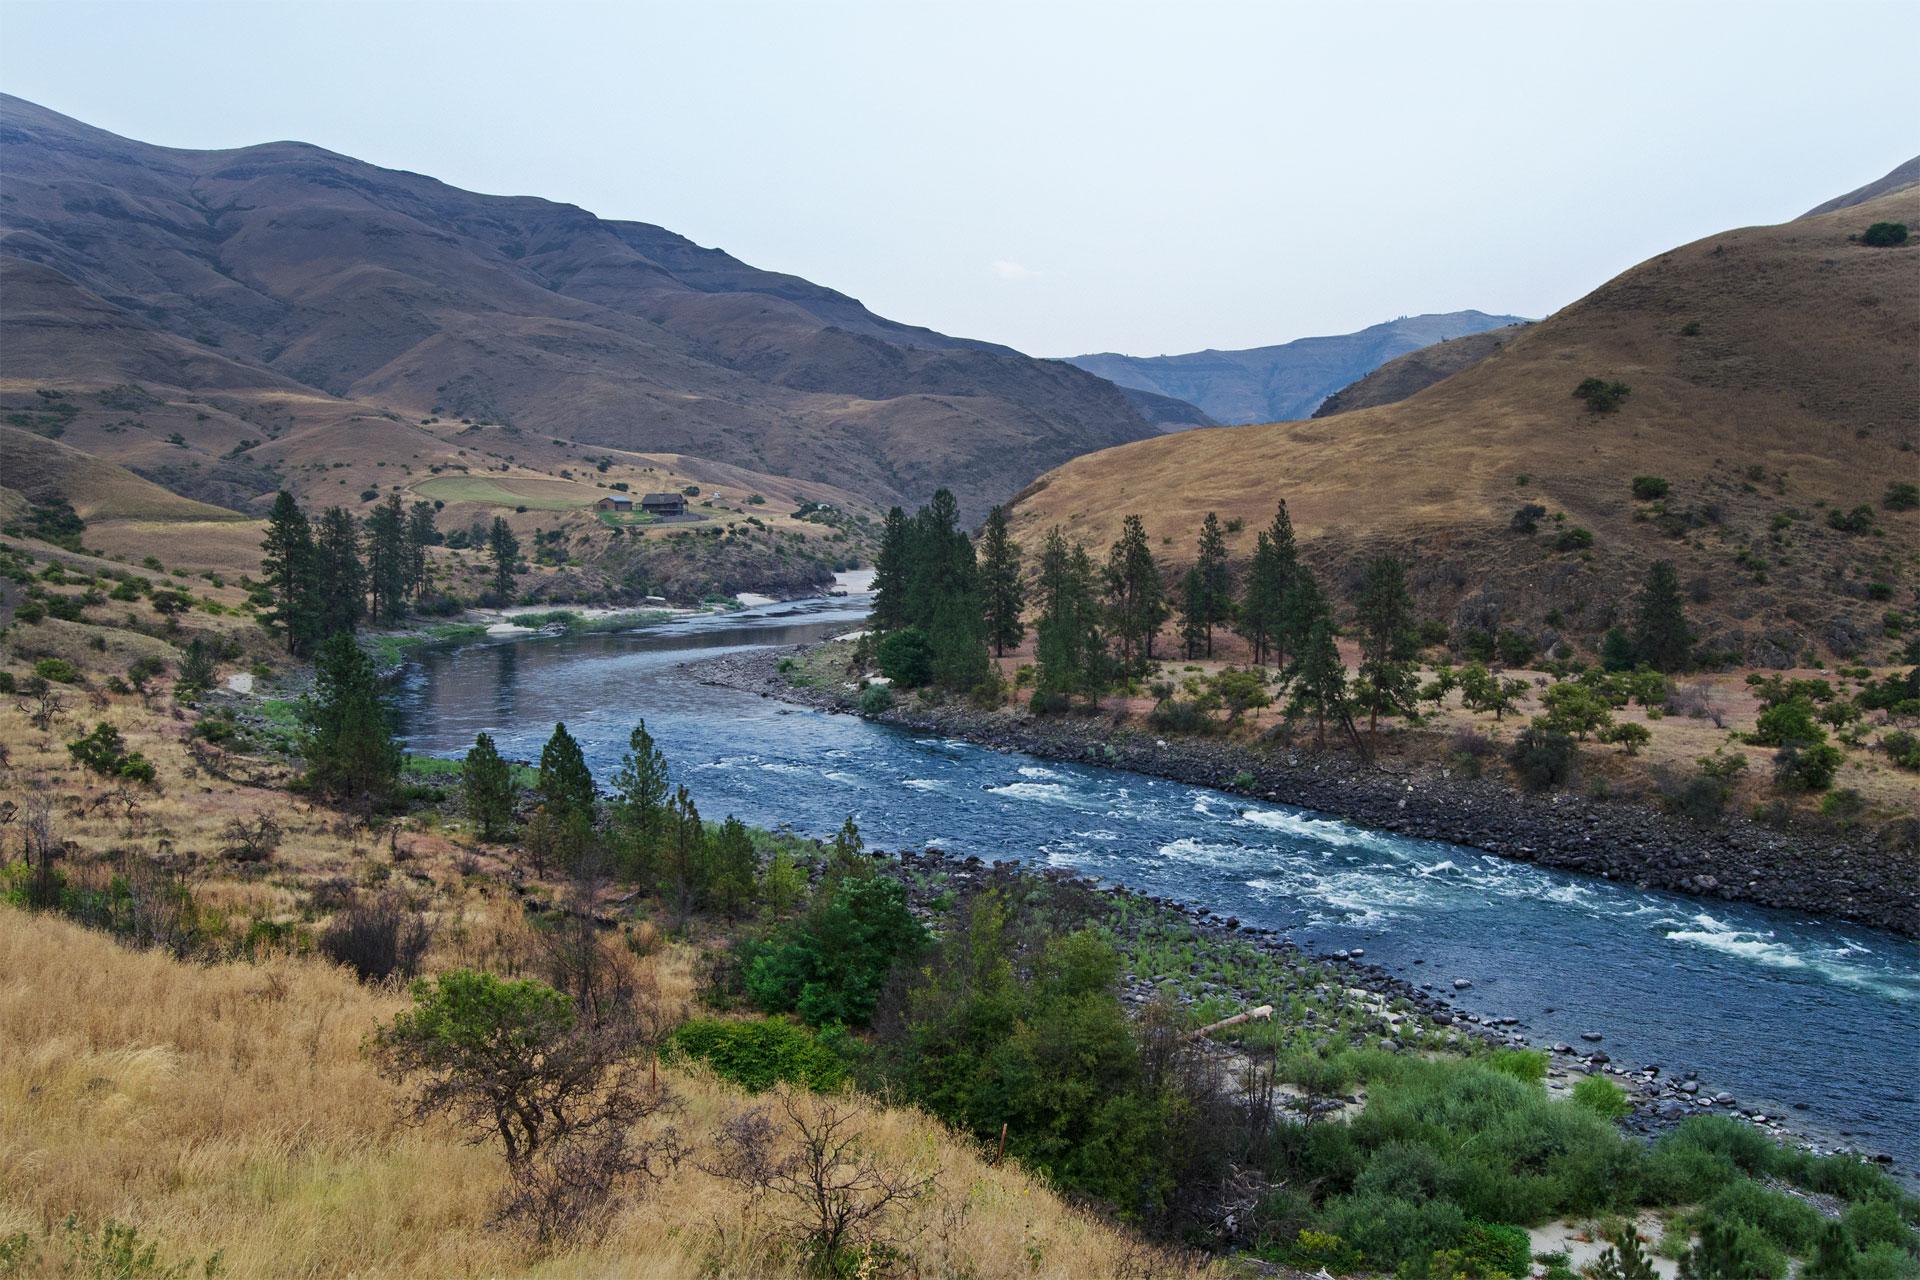 Lower Salmon River in Idaho; Courtesy of Jim Black/Shutterstock.com